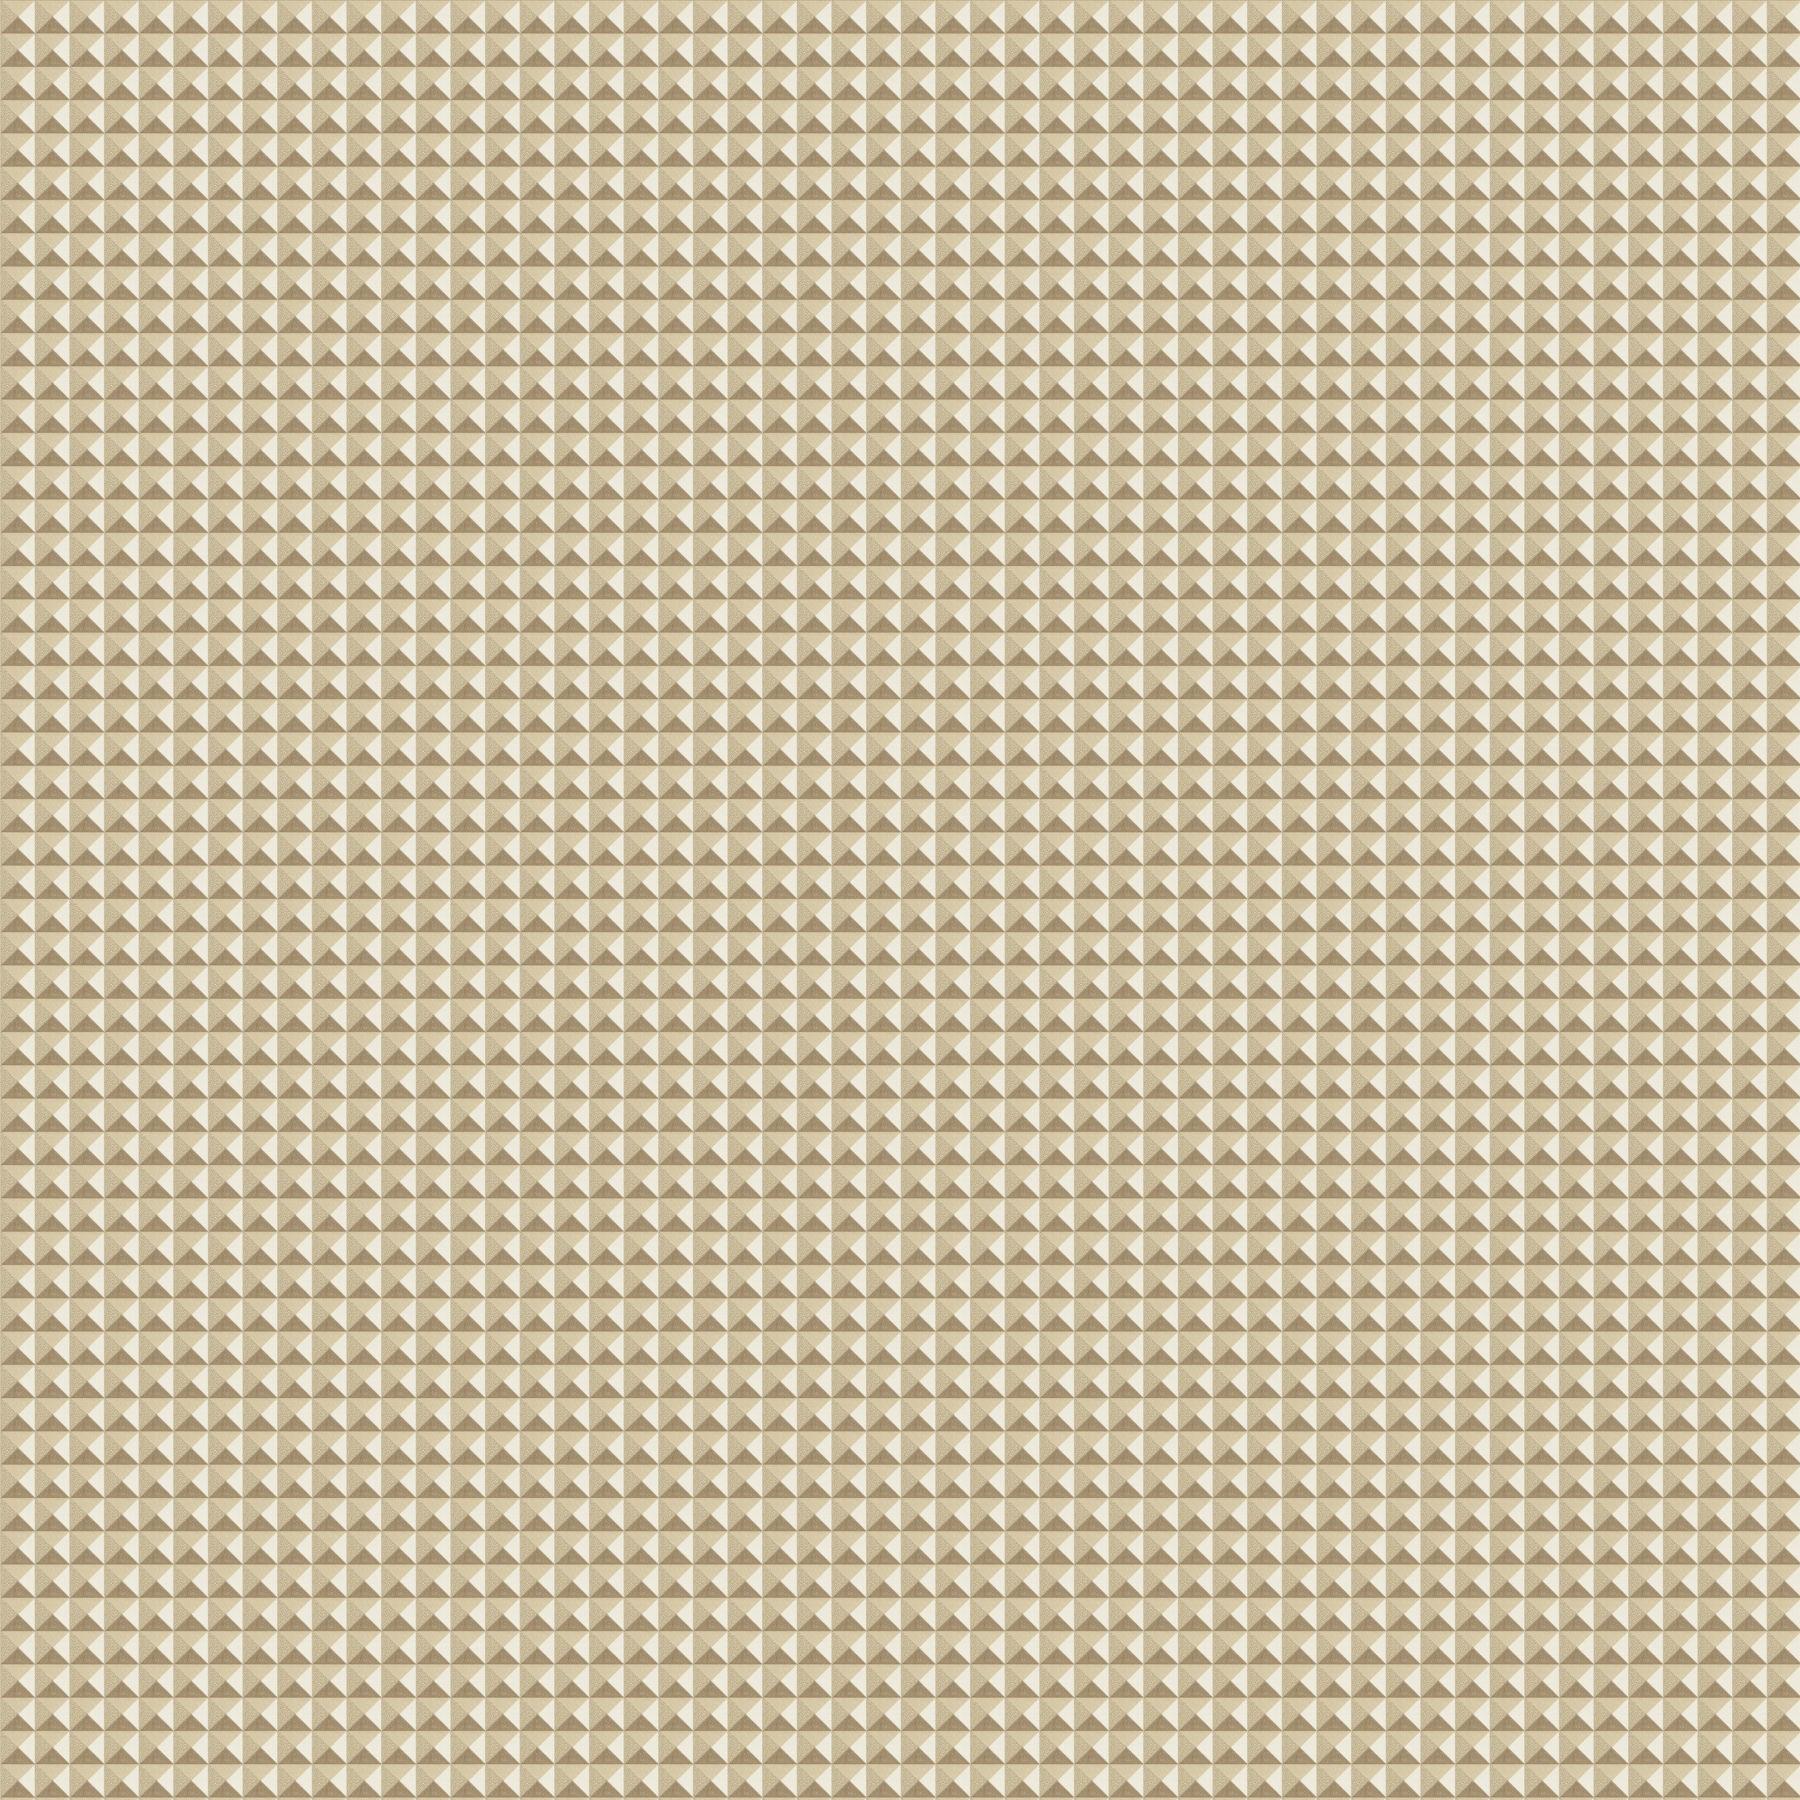 wallpapers chicago 4 4047 070 jab anstoetz fabrics. Black Bedroom Furniture Sets. Home Design Ideas